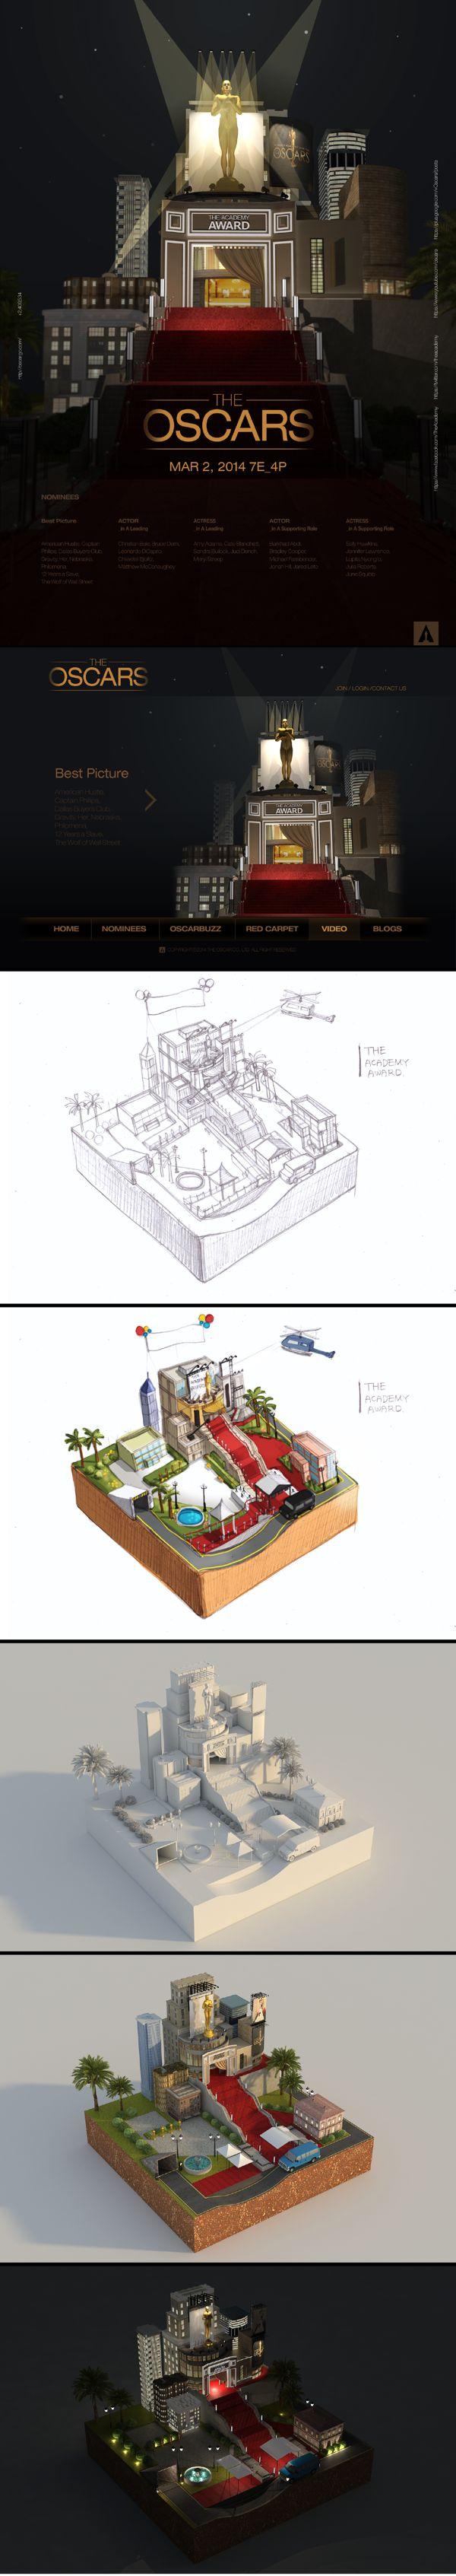 THE OSCARS by Eunjeong Yang, via Behance